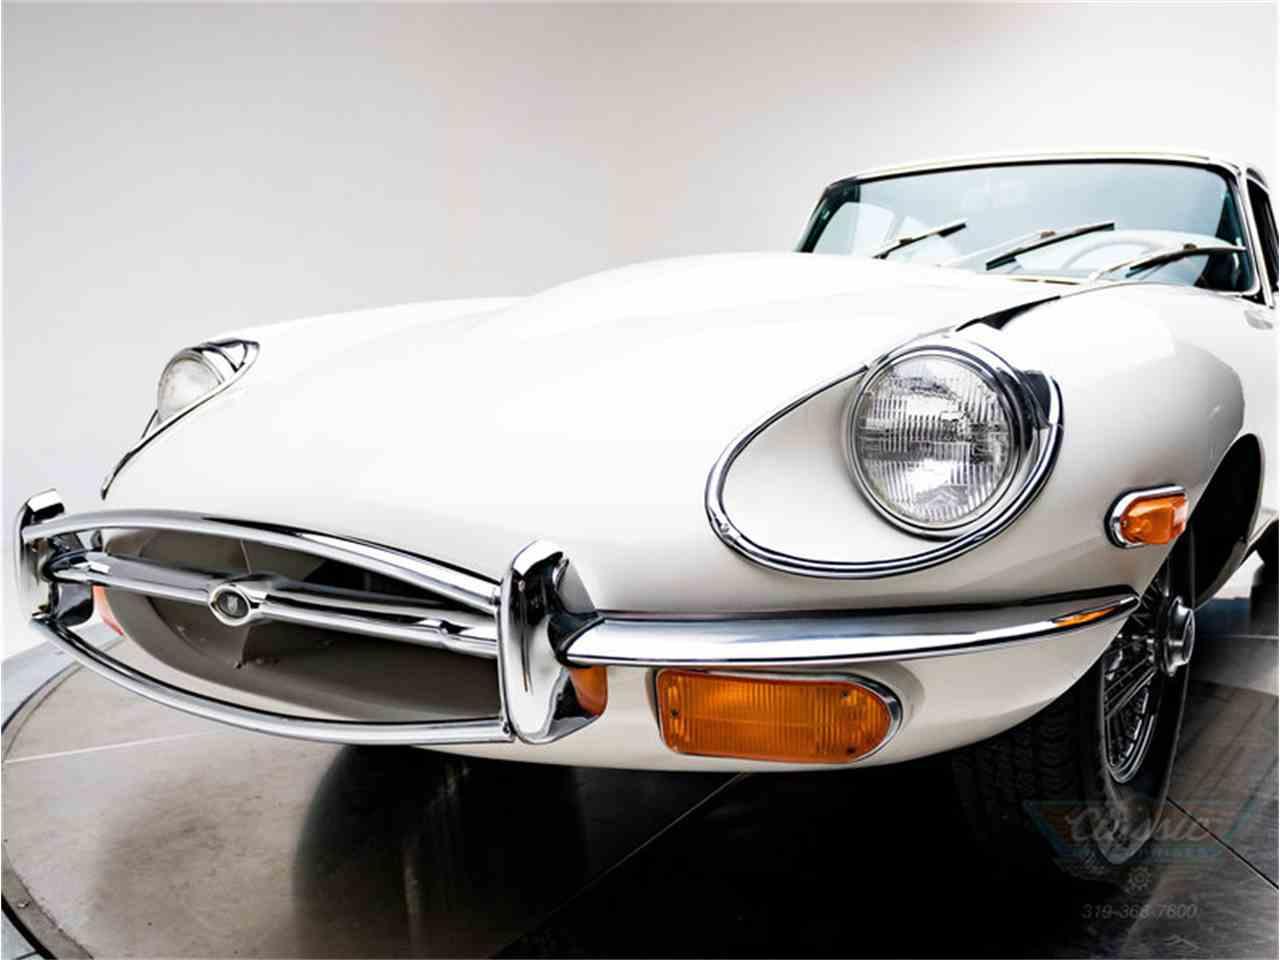 1971 Jaguar XKE for Sale | ClassicCars.com | CC-1043251